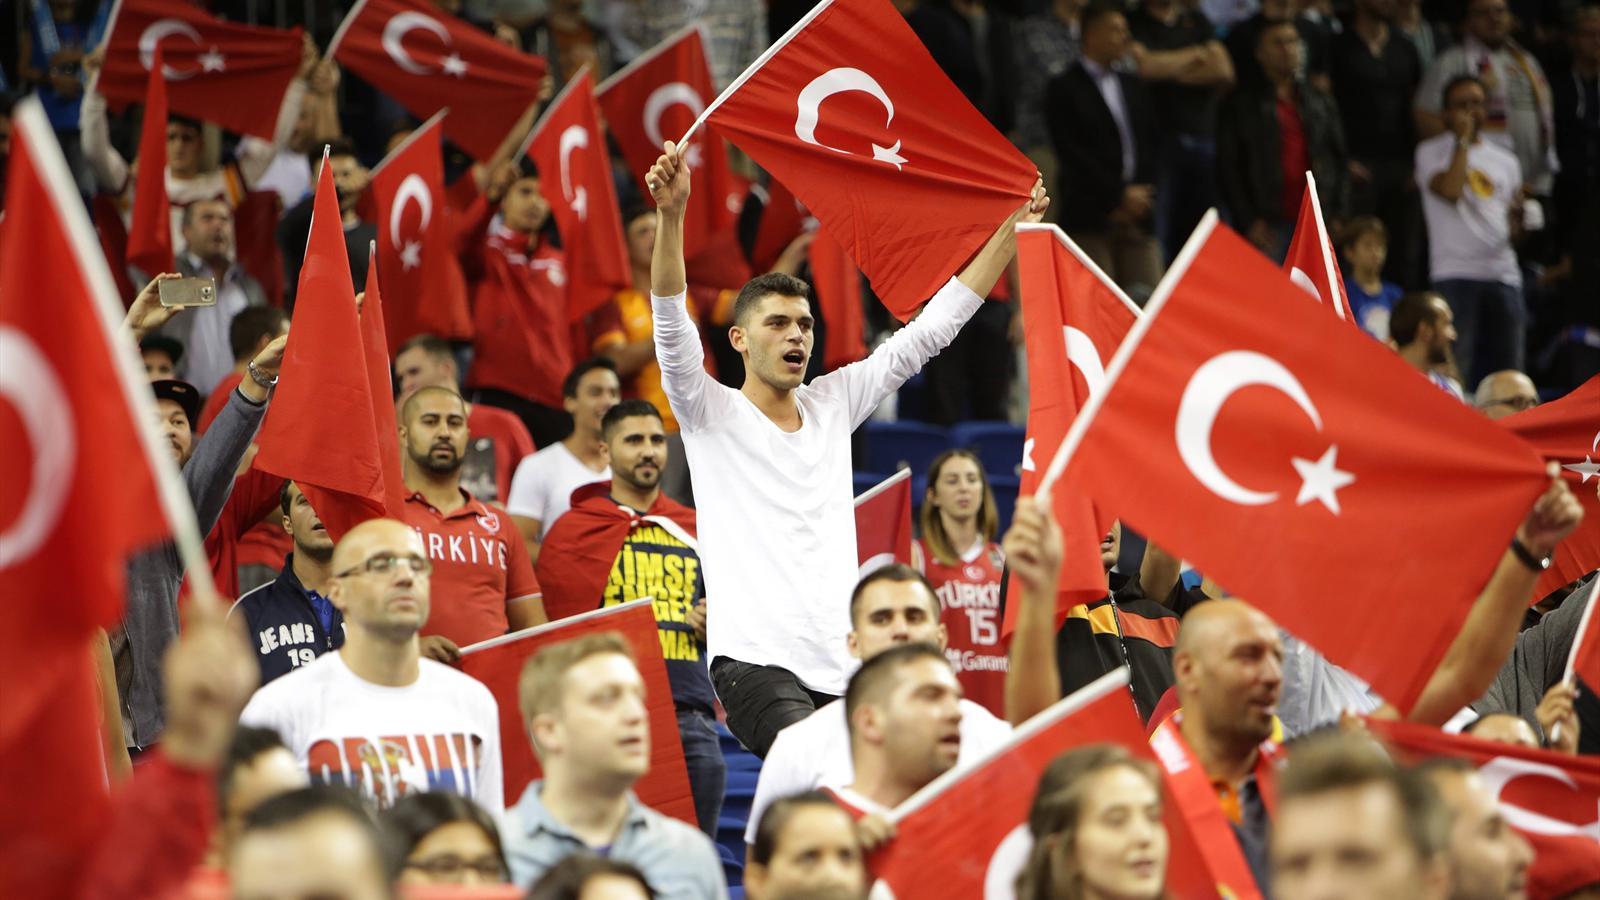 Турция 2016 2017